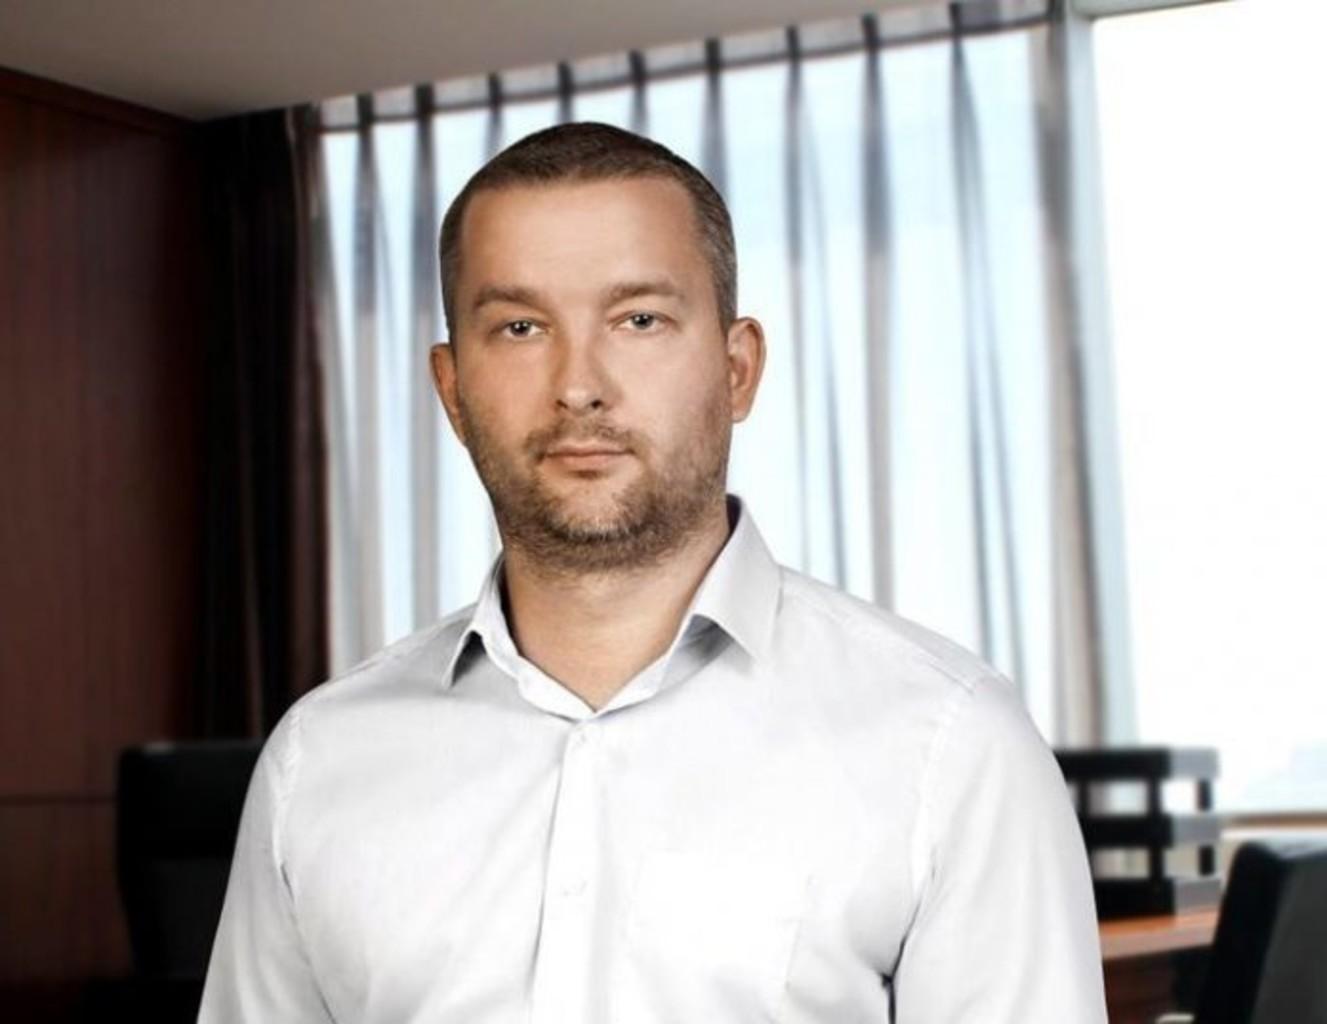 Sergey cherechen bsdg te7pd 696x537